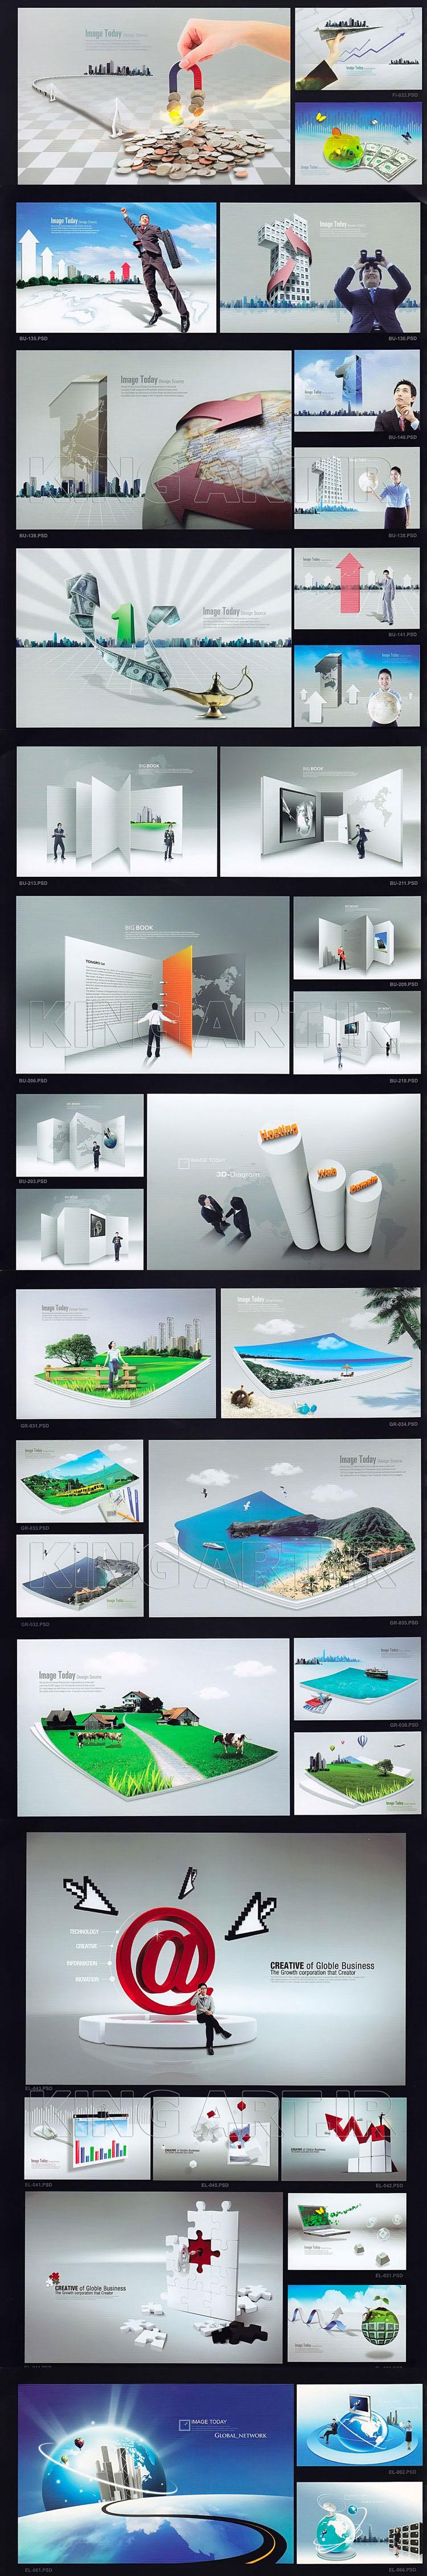 NEW IDEAS PSD-3 ایده تبلیغاتی ایده تبلیغات ایده های تبلیغاتی ایده برای تبلیغات ایده های لایه باز خلاقانه